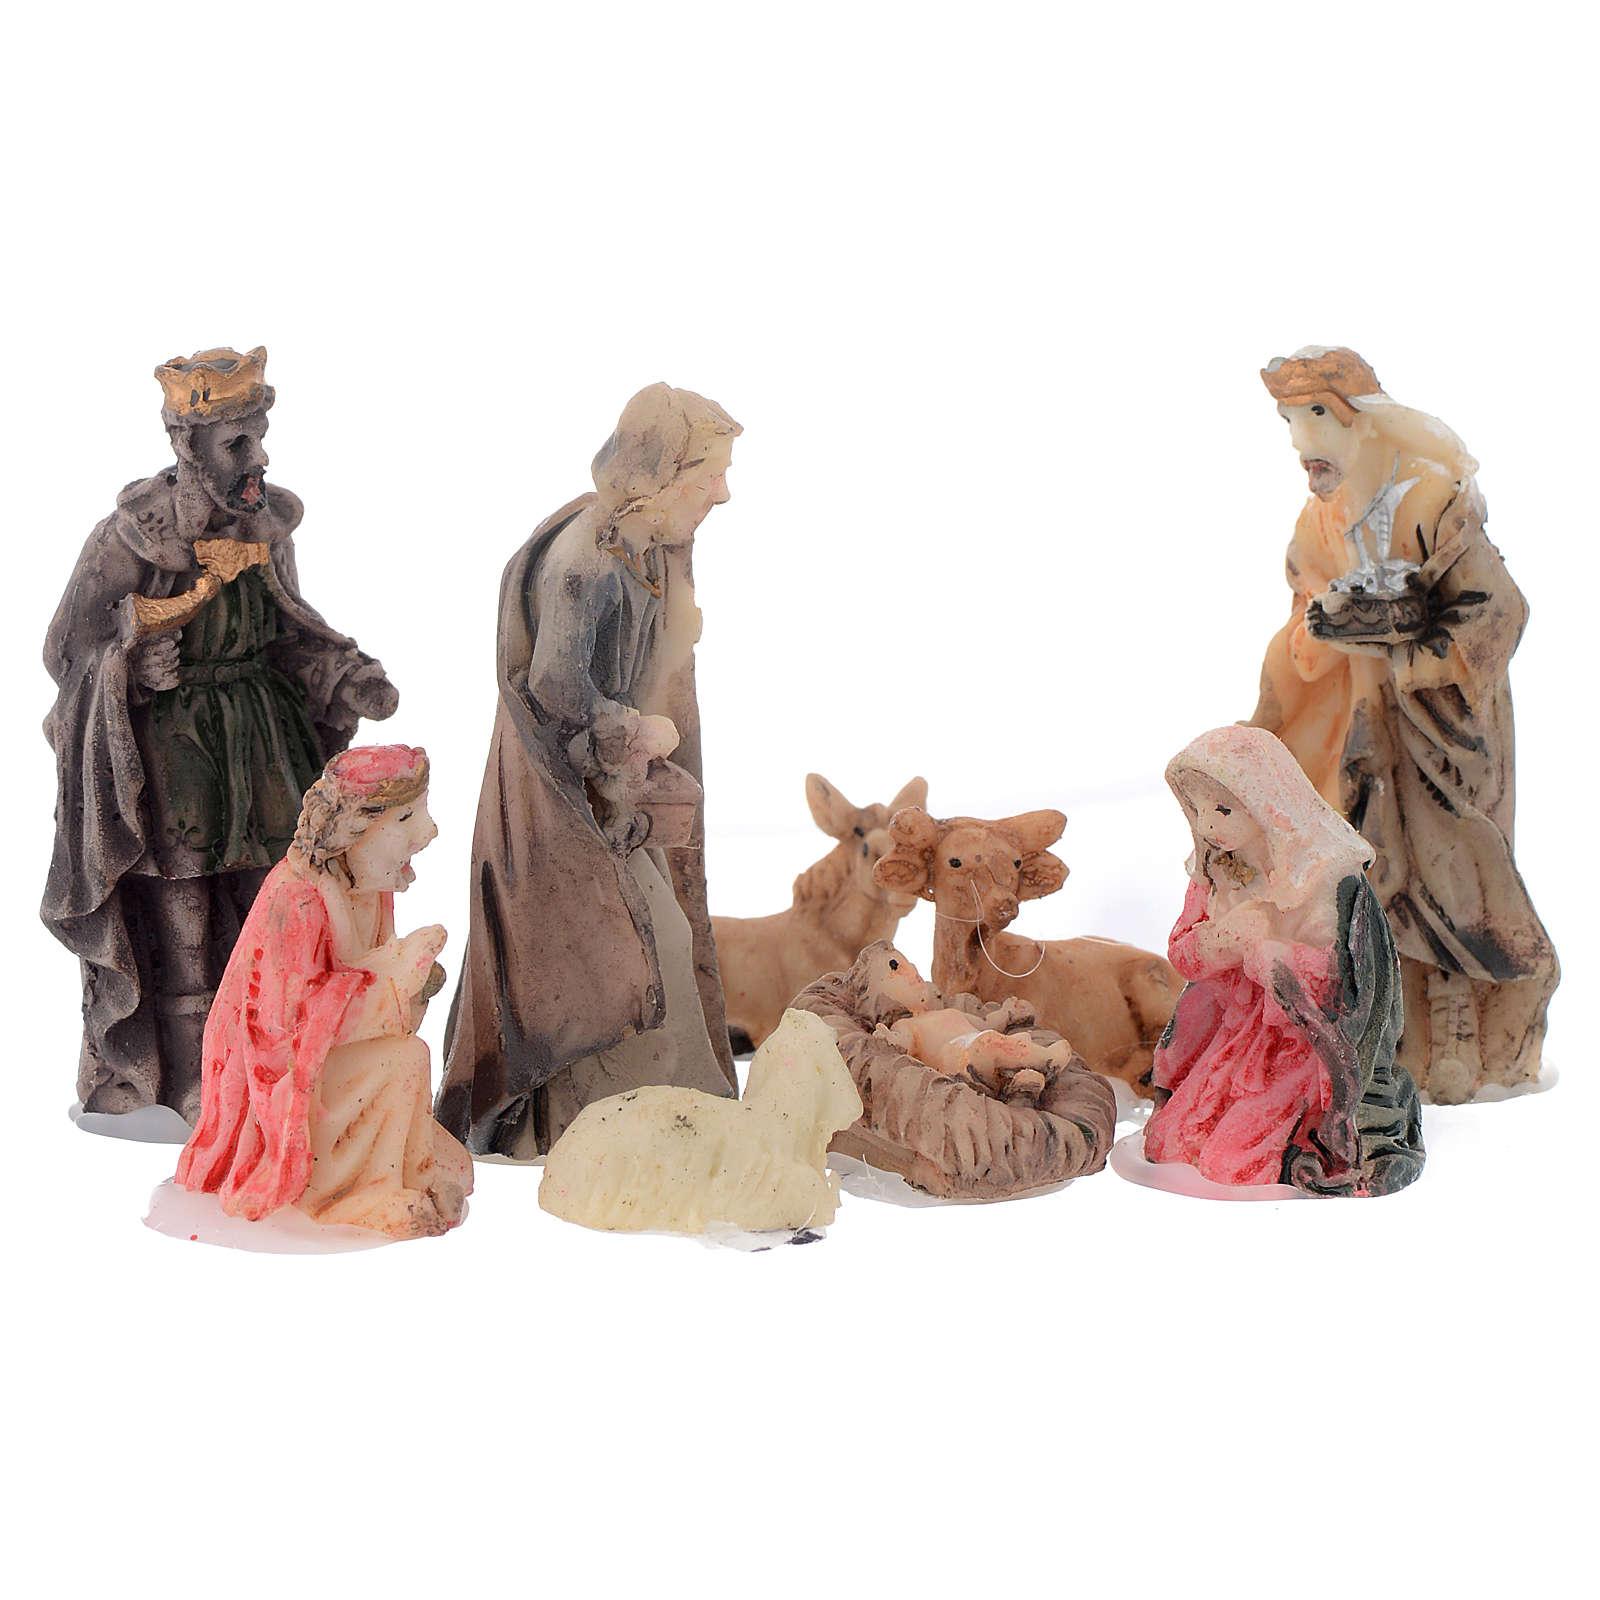 Mini nativity set in resin measuring 5cm, 9 figurines 4